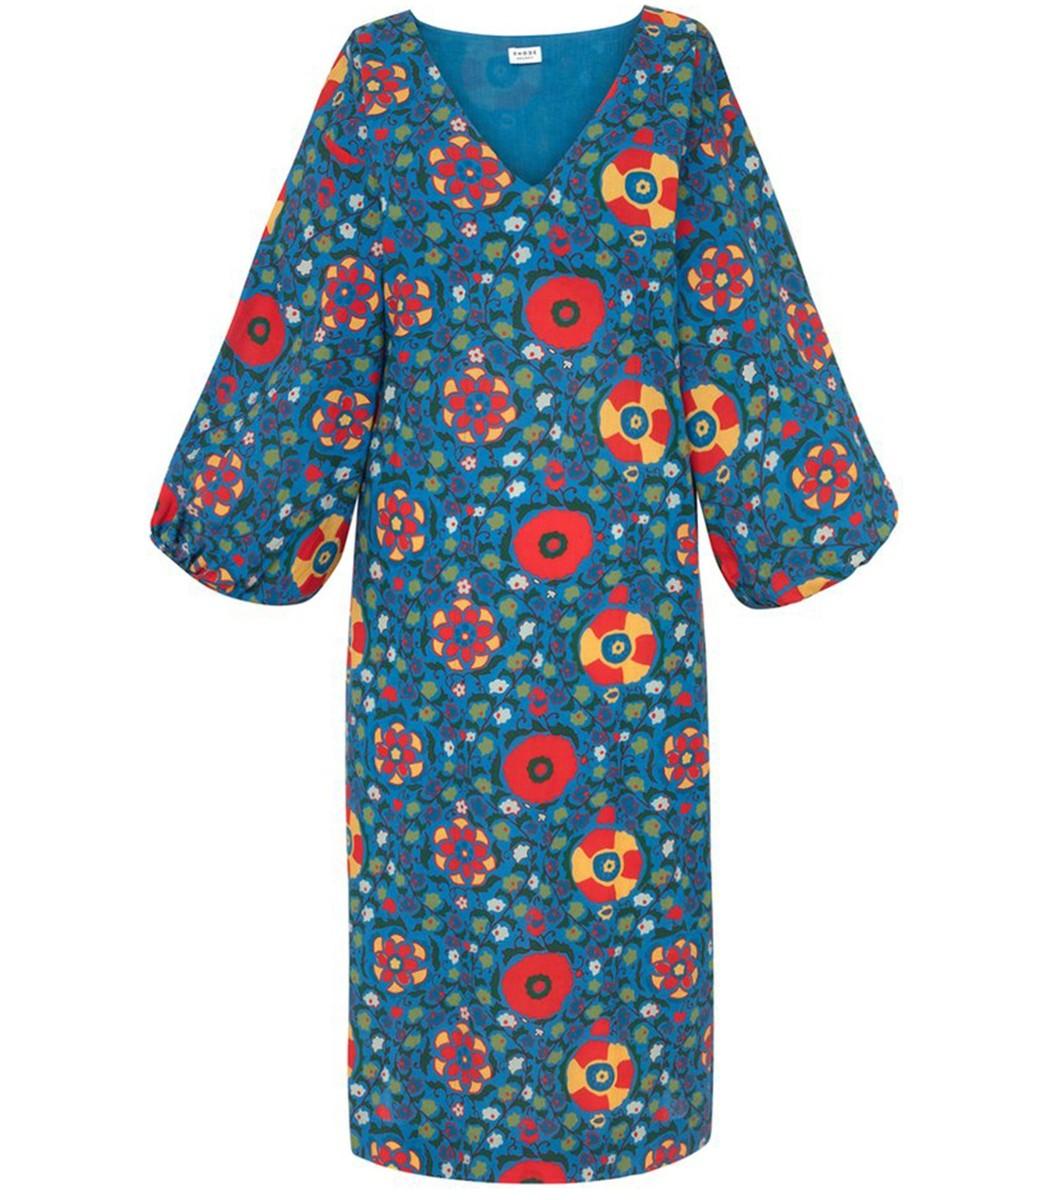 RHODE RESORT Delilah Dress in Blue Multiflower